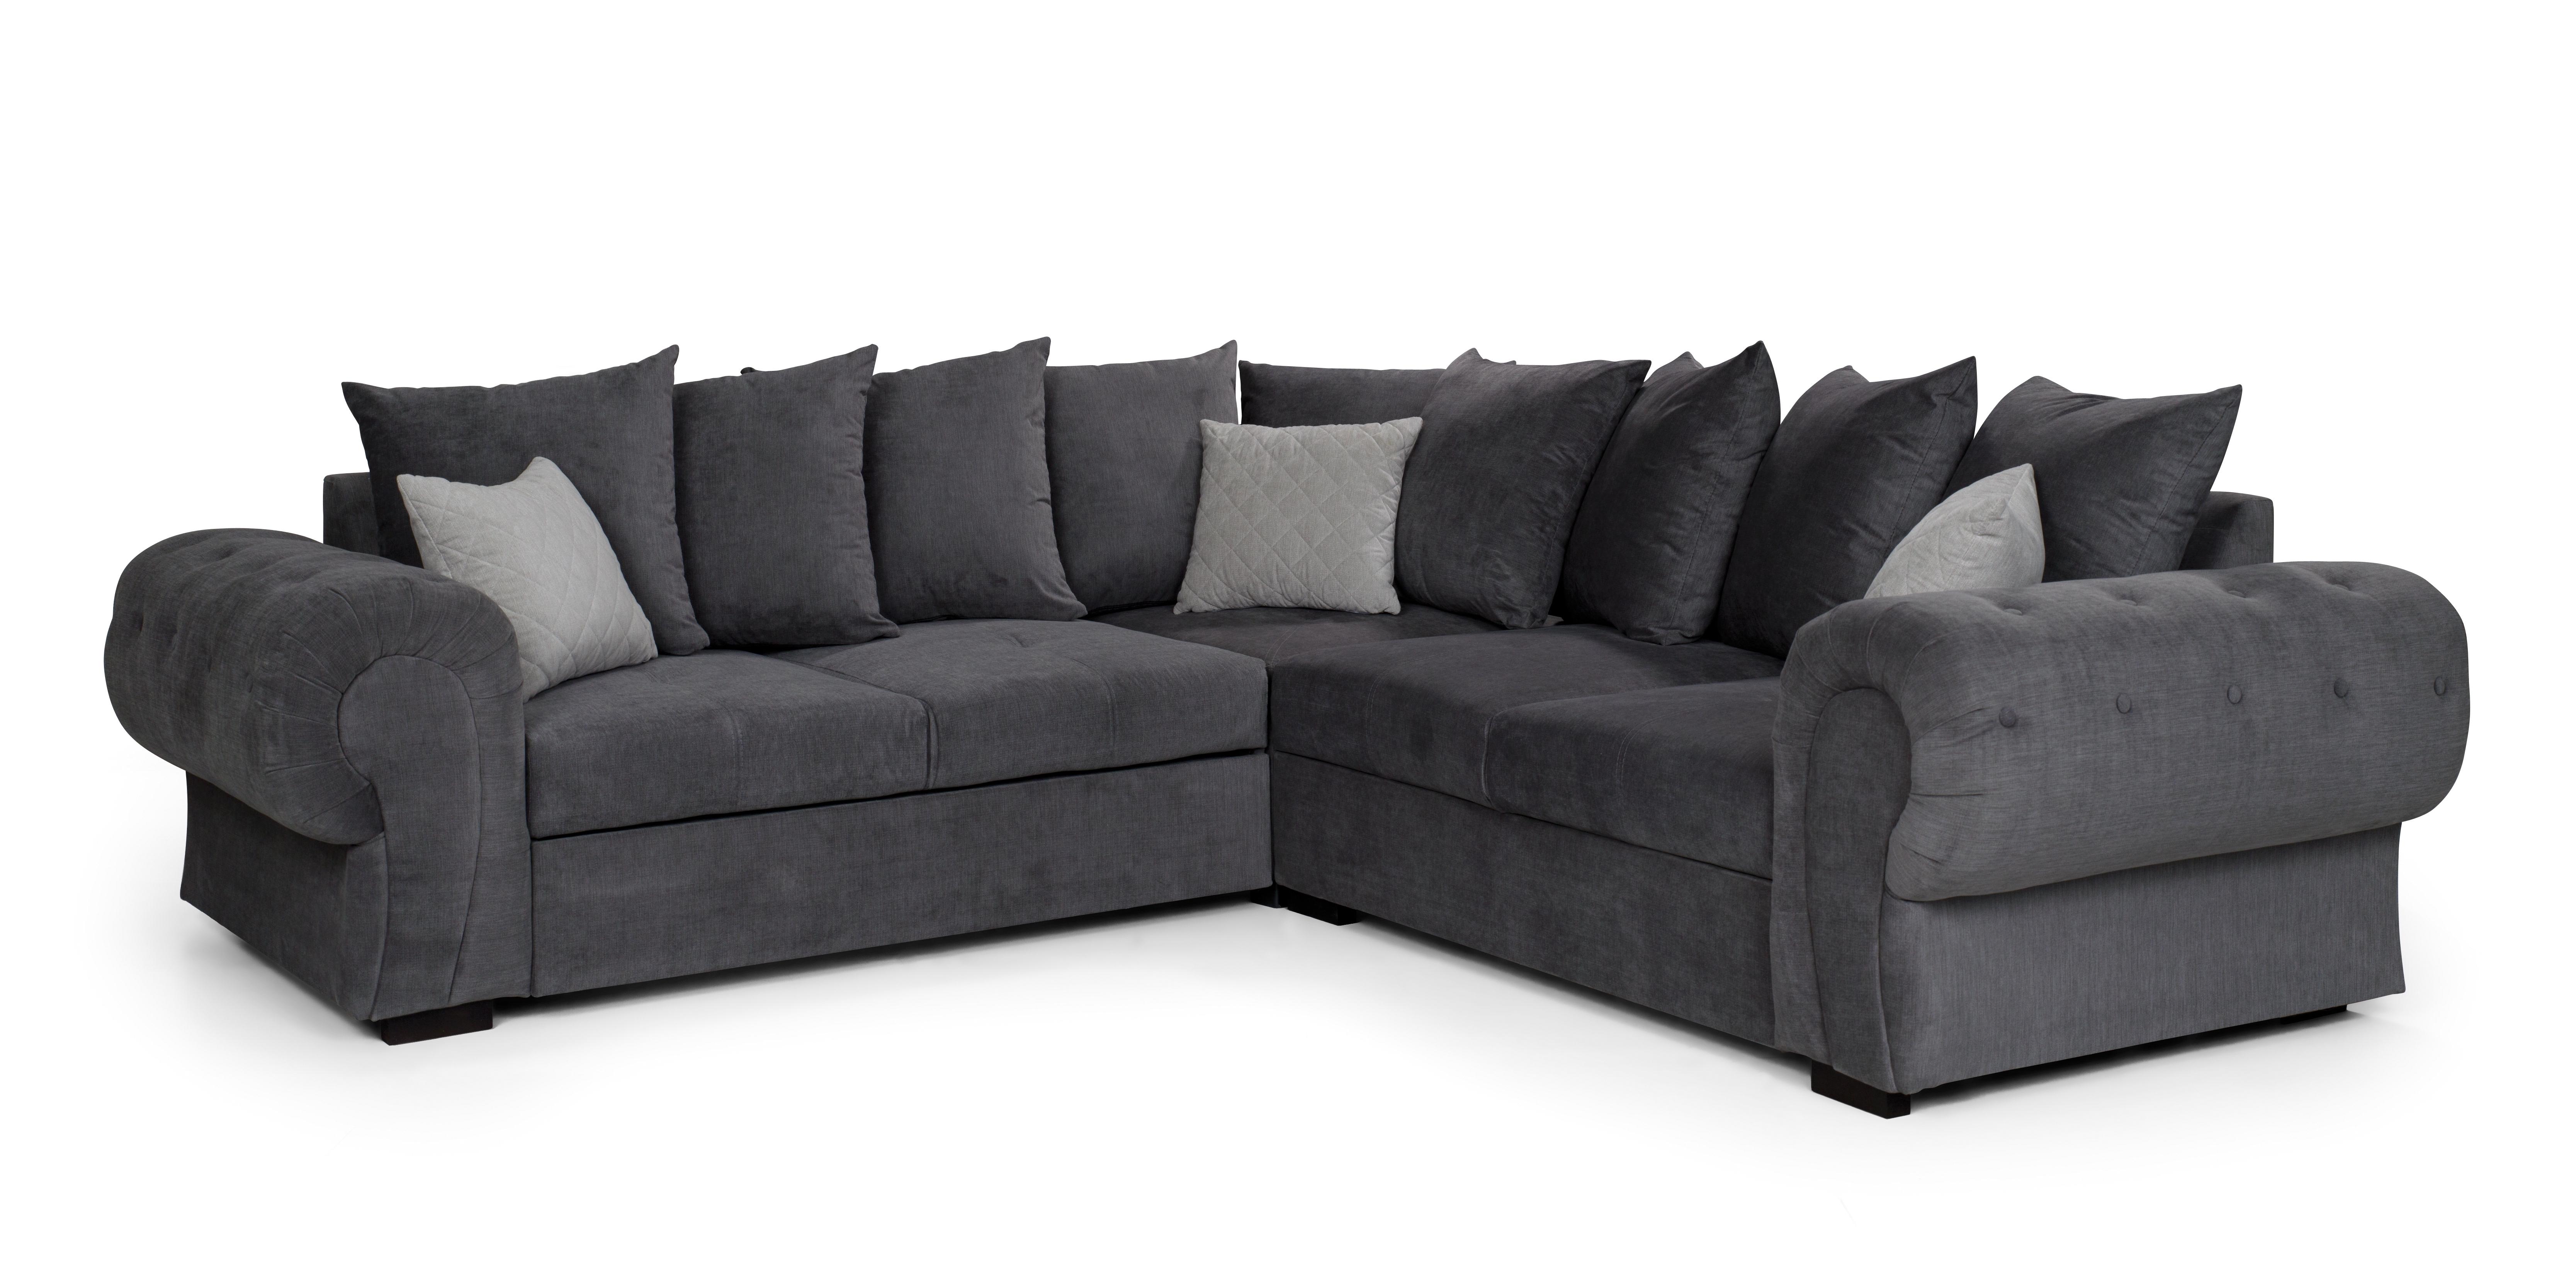 new product b4342 2fadd Details about NIKO, VERONA CORNER SOFA BED WITH STORAGE, DARK GREY - FABRIC  254 cm x 254 cm